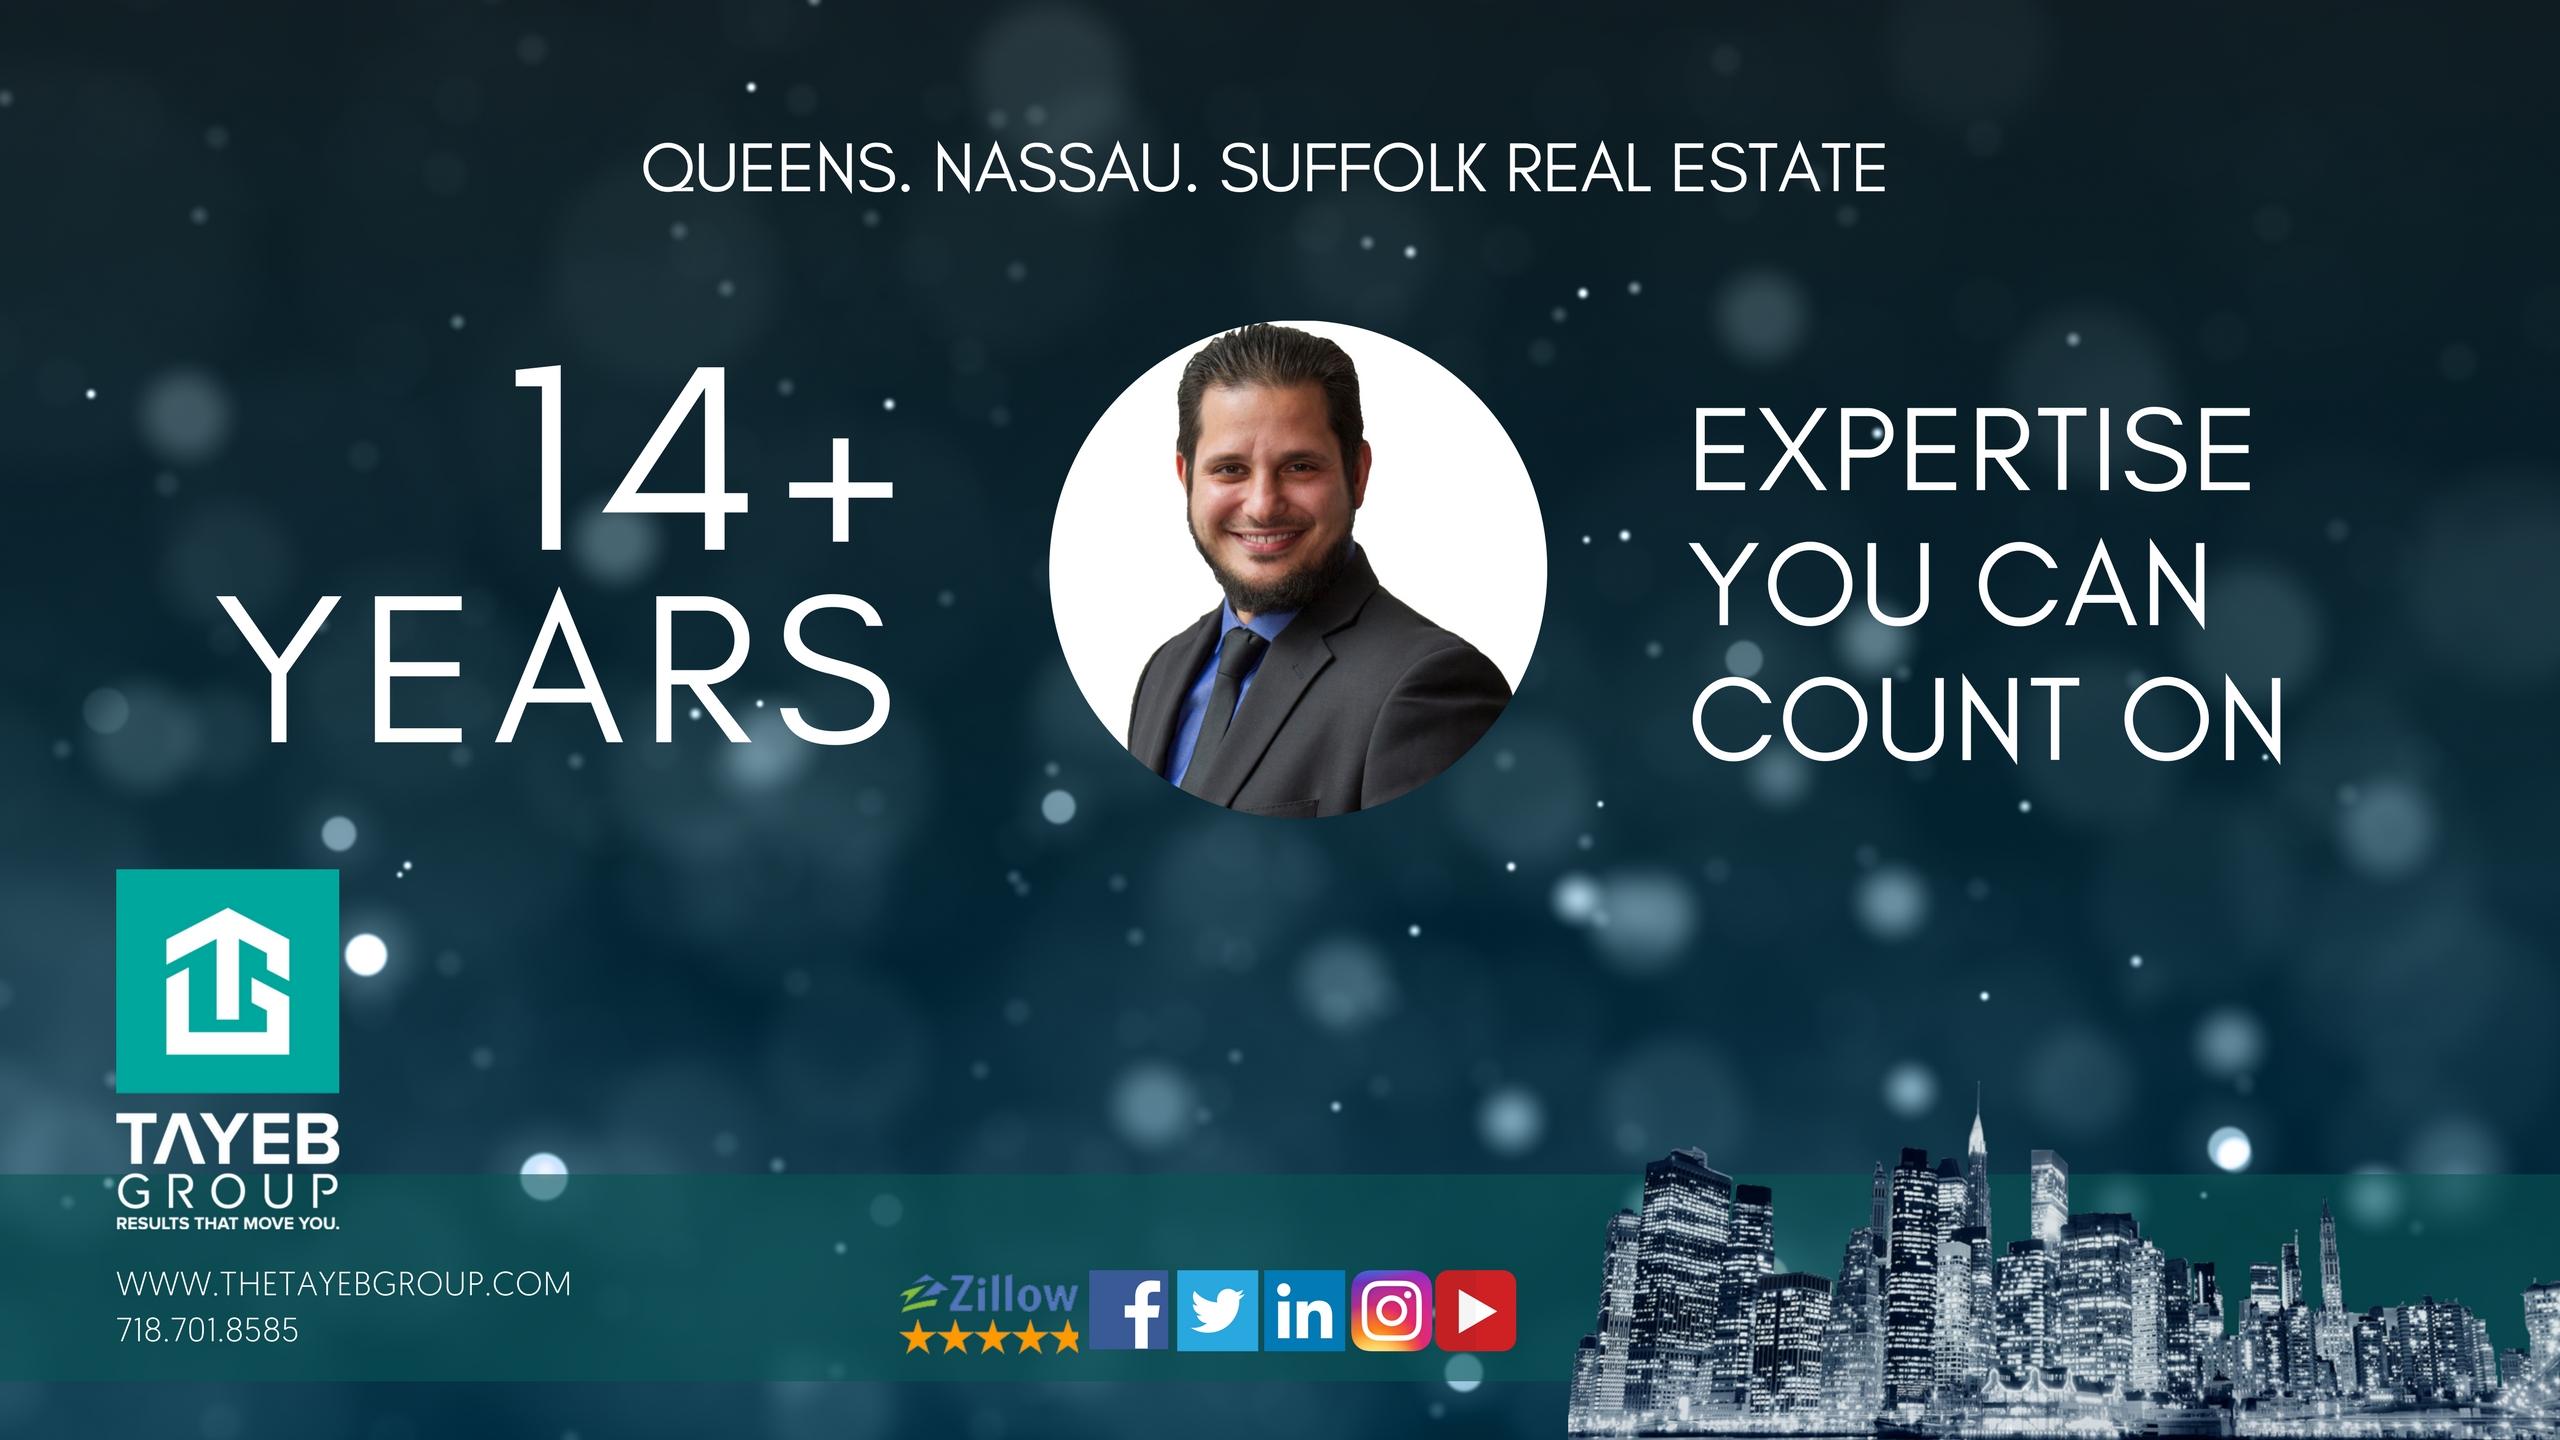 Tayeb Group Real Estate